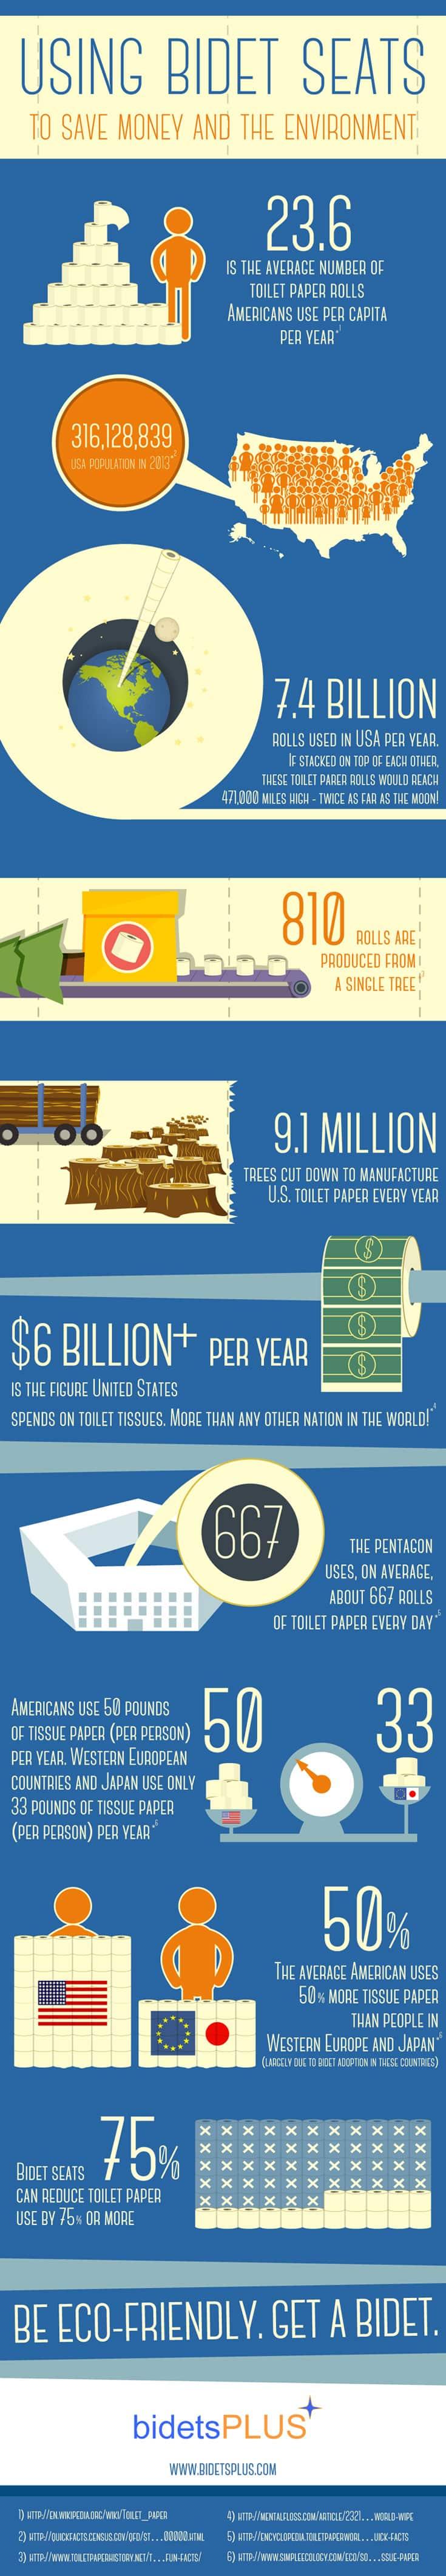 bidet seat infographic